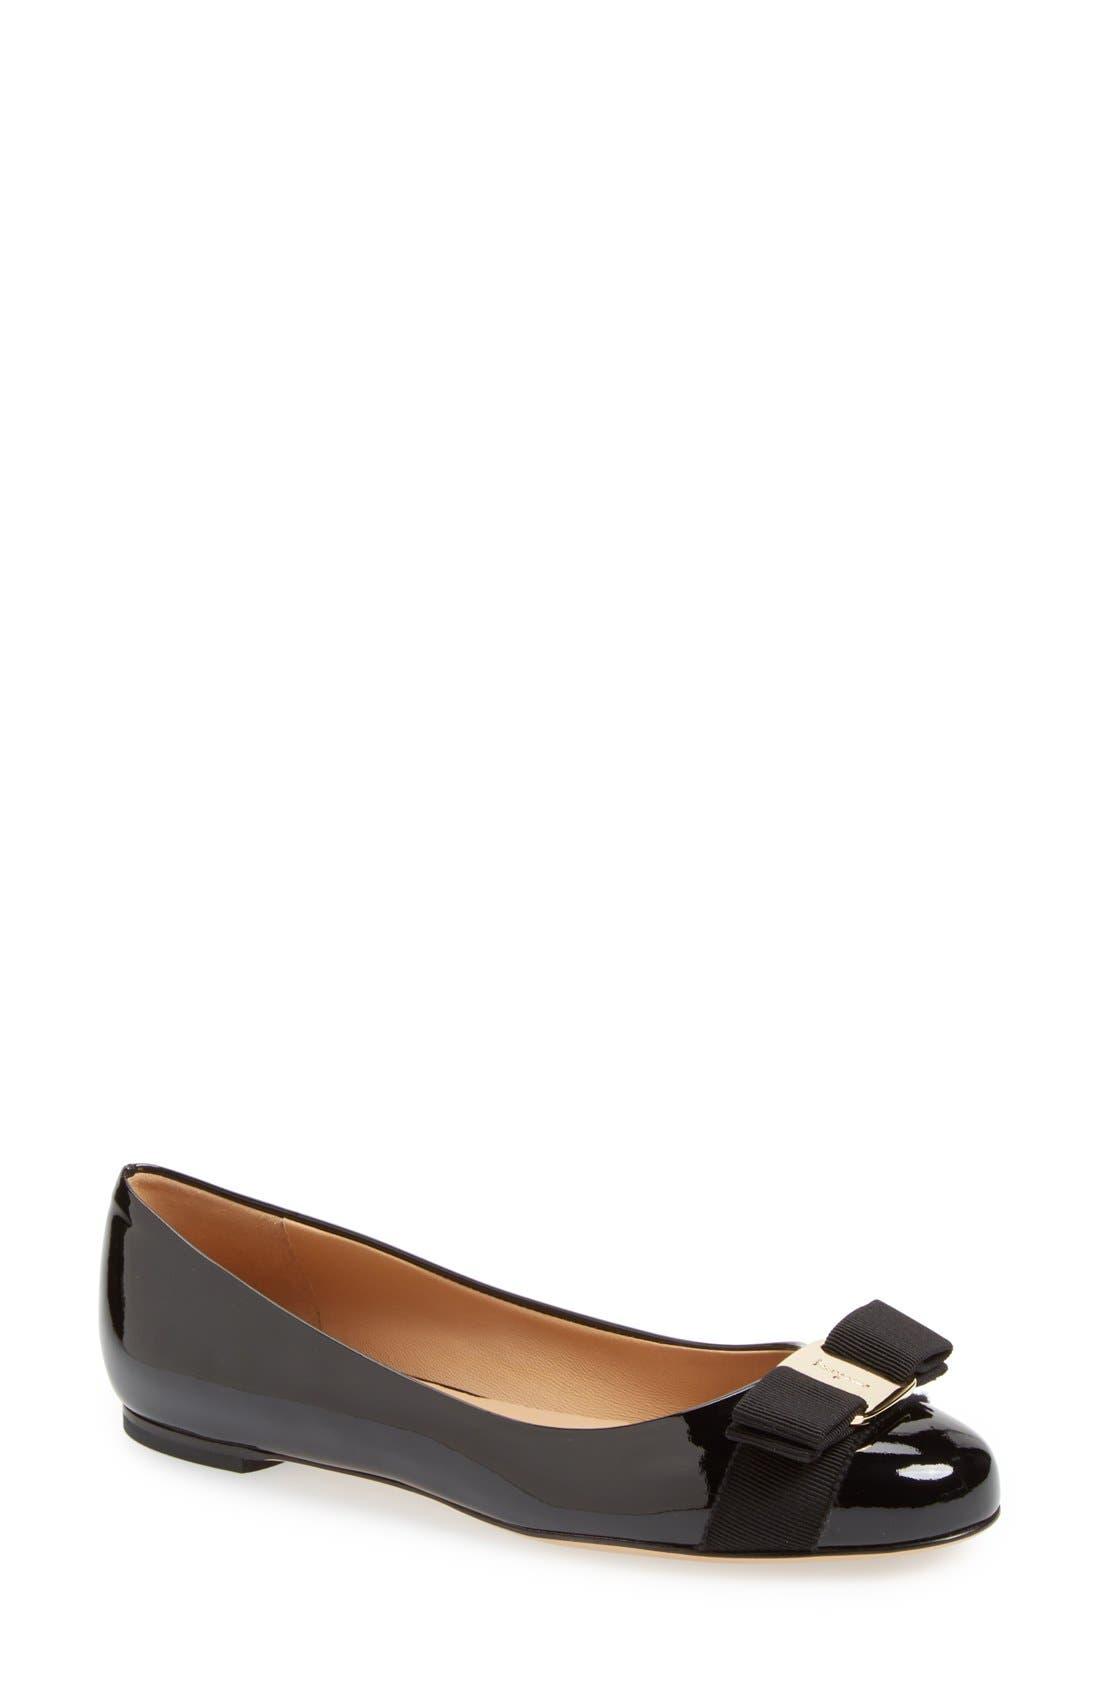 SALVATORE FERRAGAMO Varina Leather Flat, Main, color, NERO PATENT/ GOLD